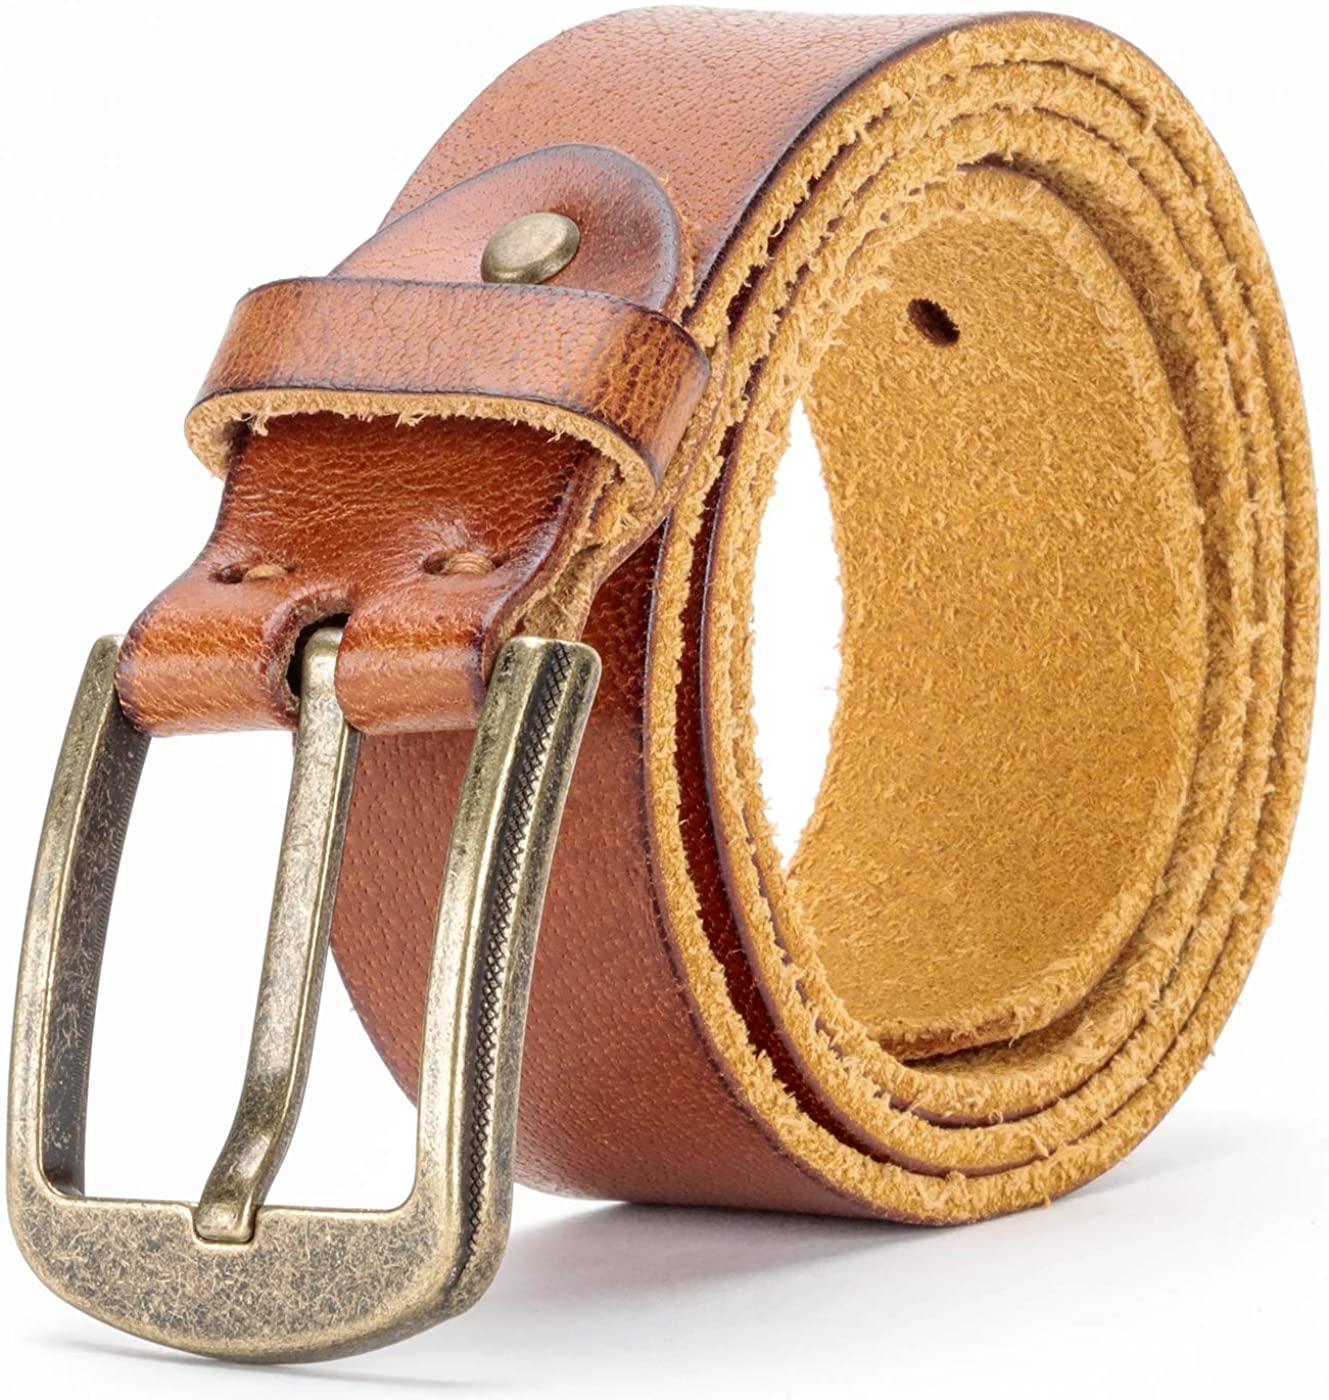 Men's 100% Full Grain Leather Belt Men With Single Prong Buckle Jeans Dress